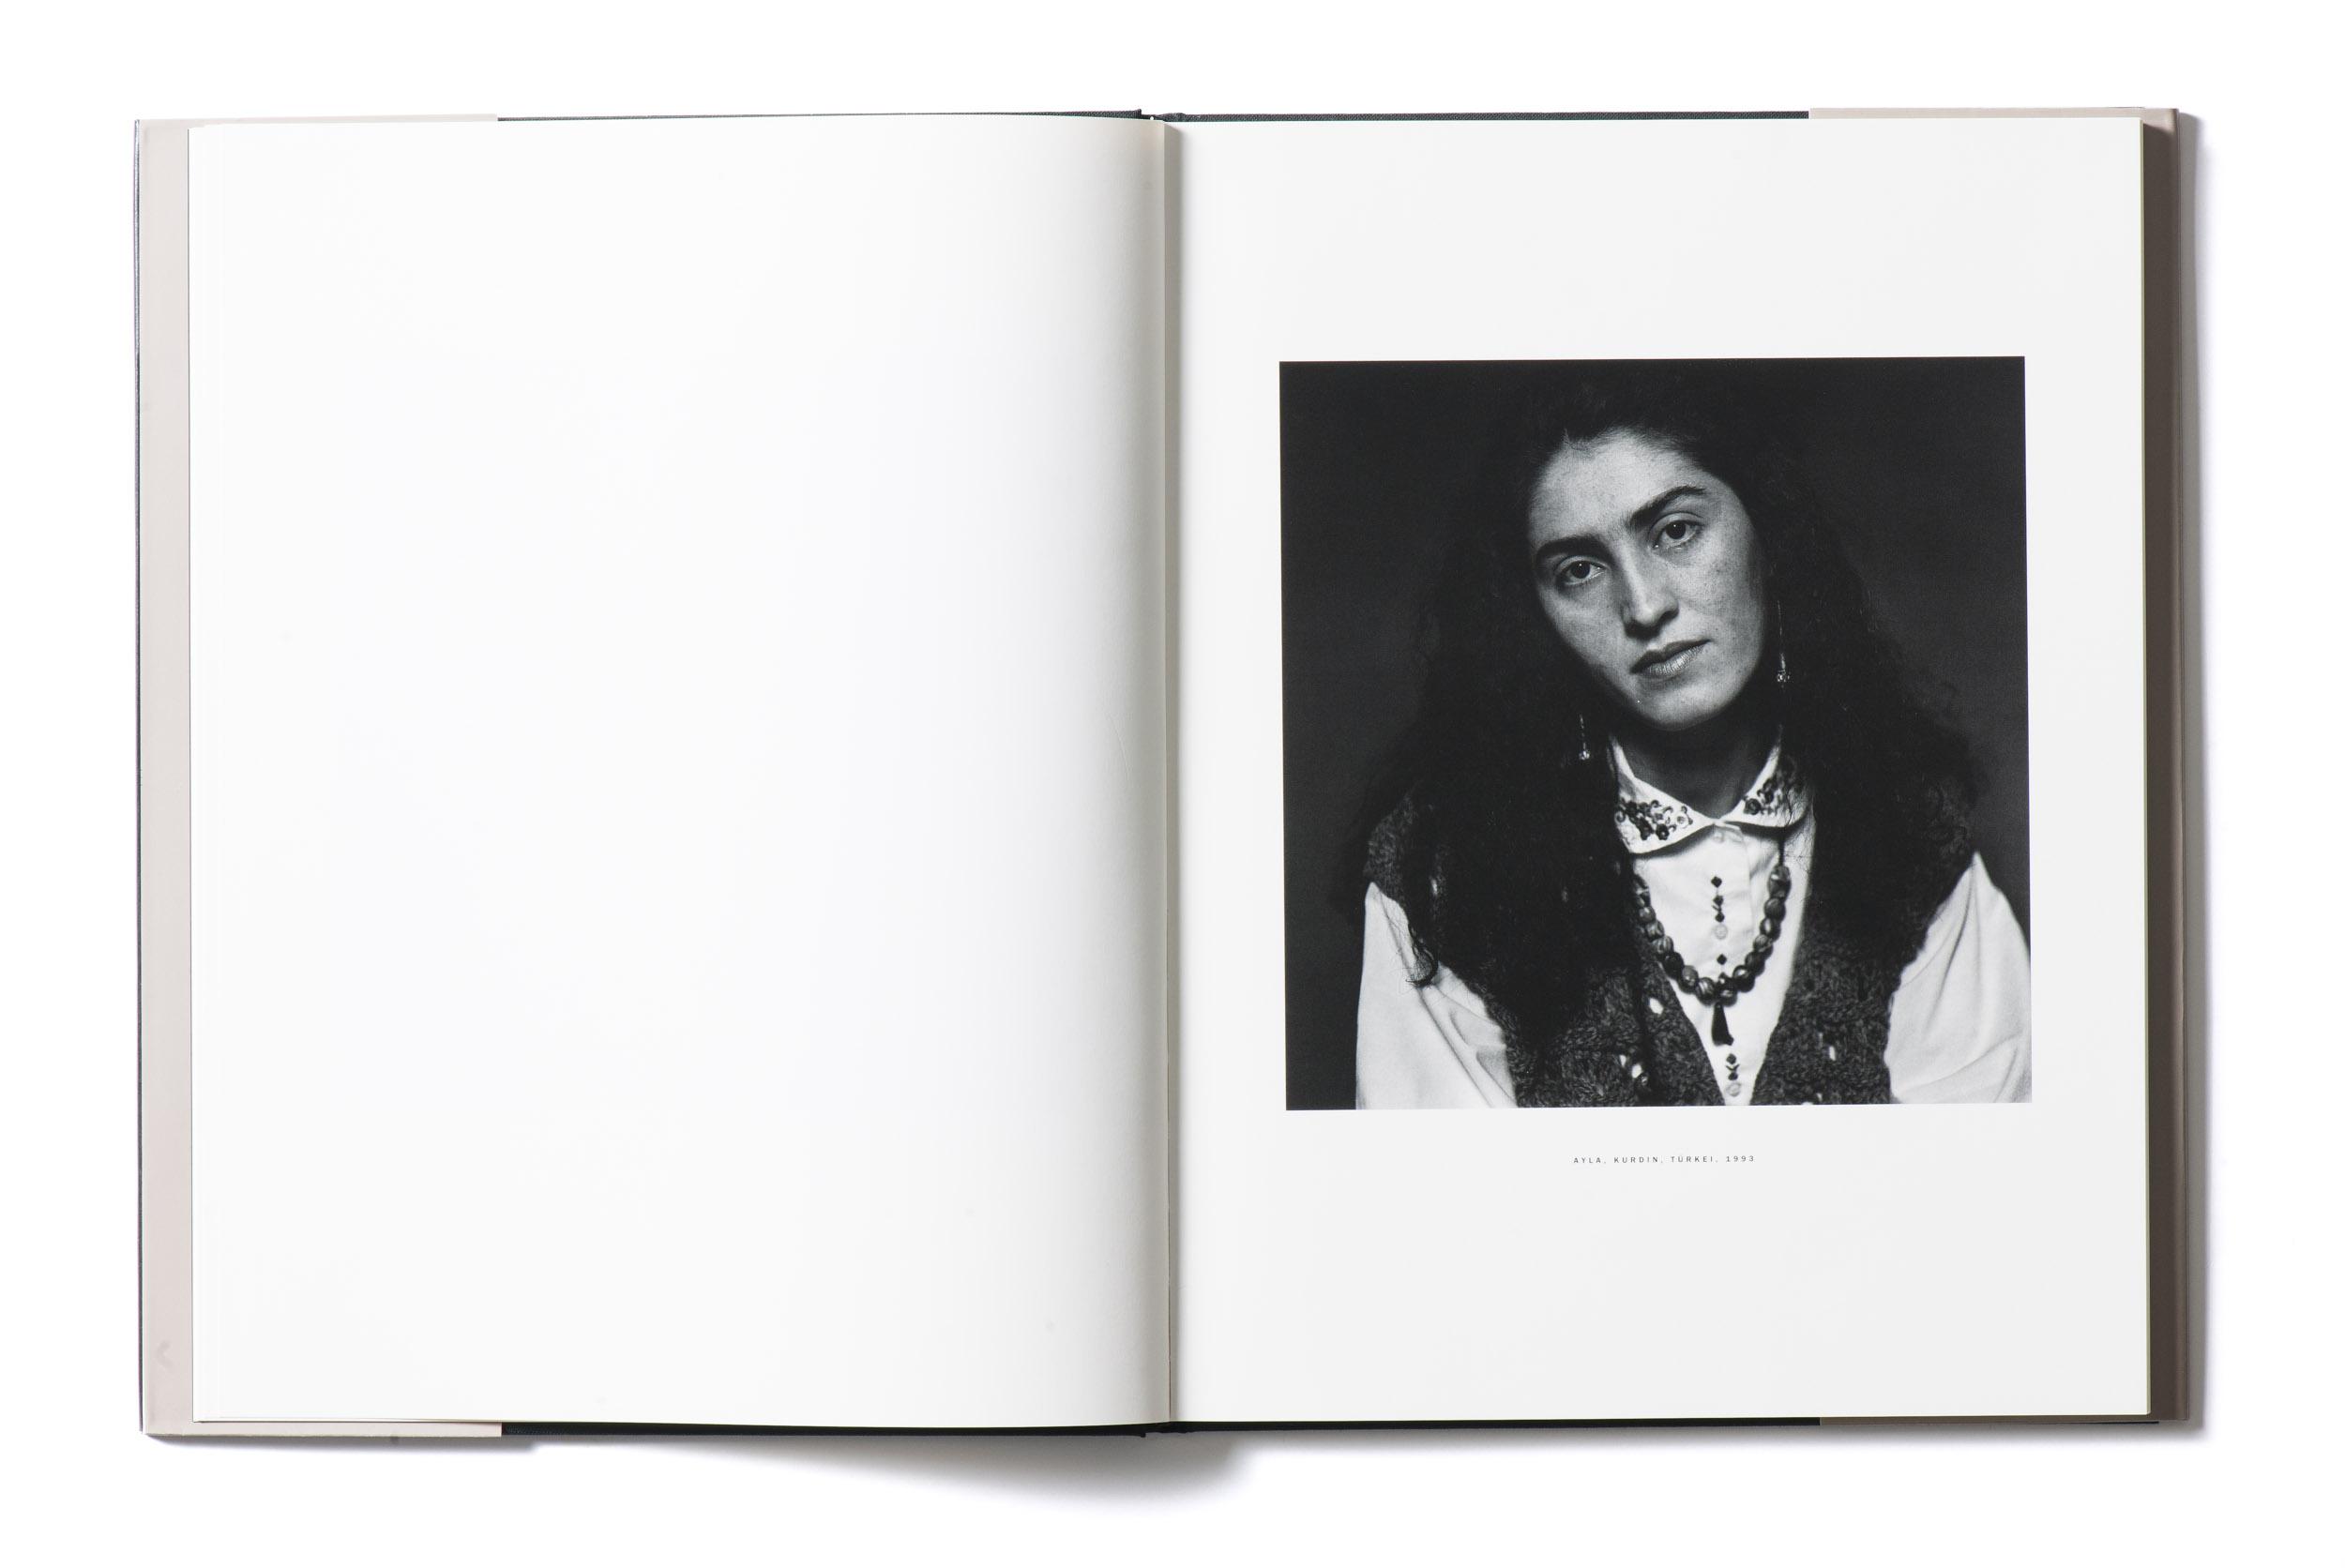 Kunstband Fotografien Peter Hebeisen Titel Feindbilder #2